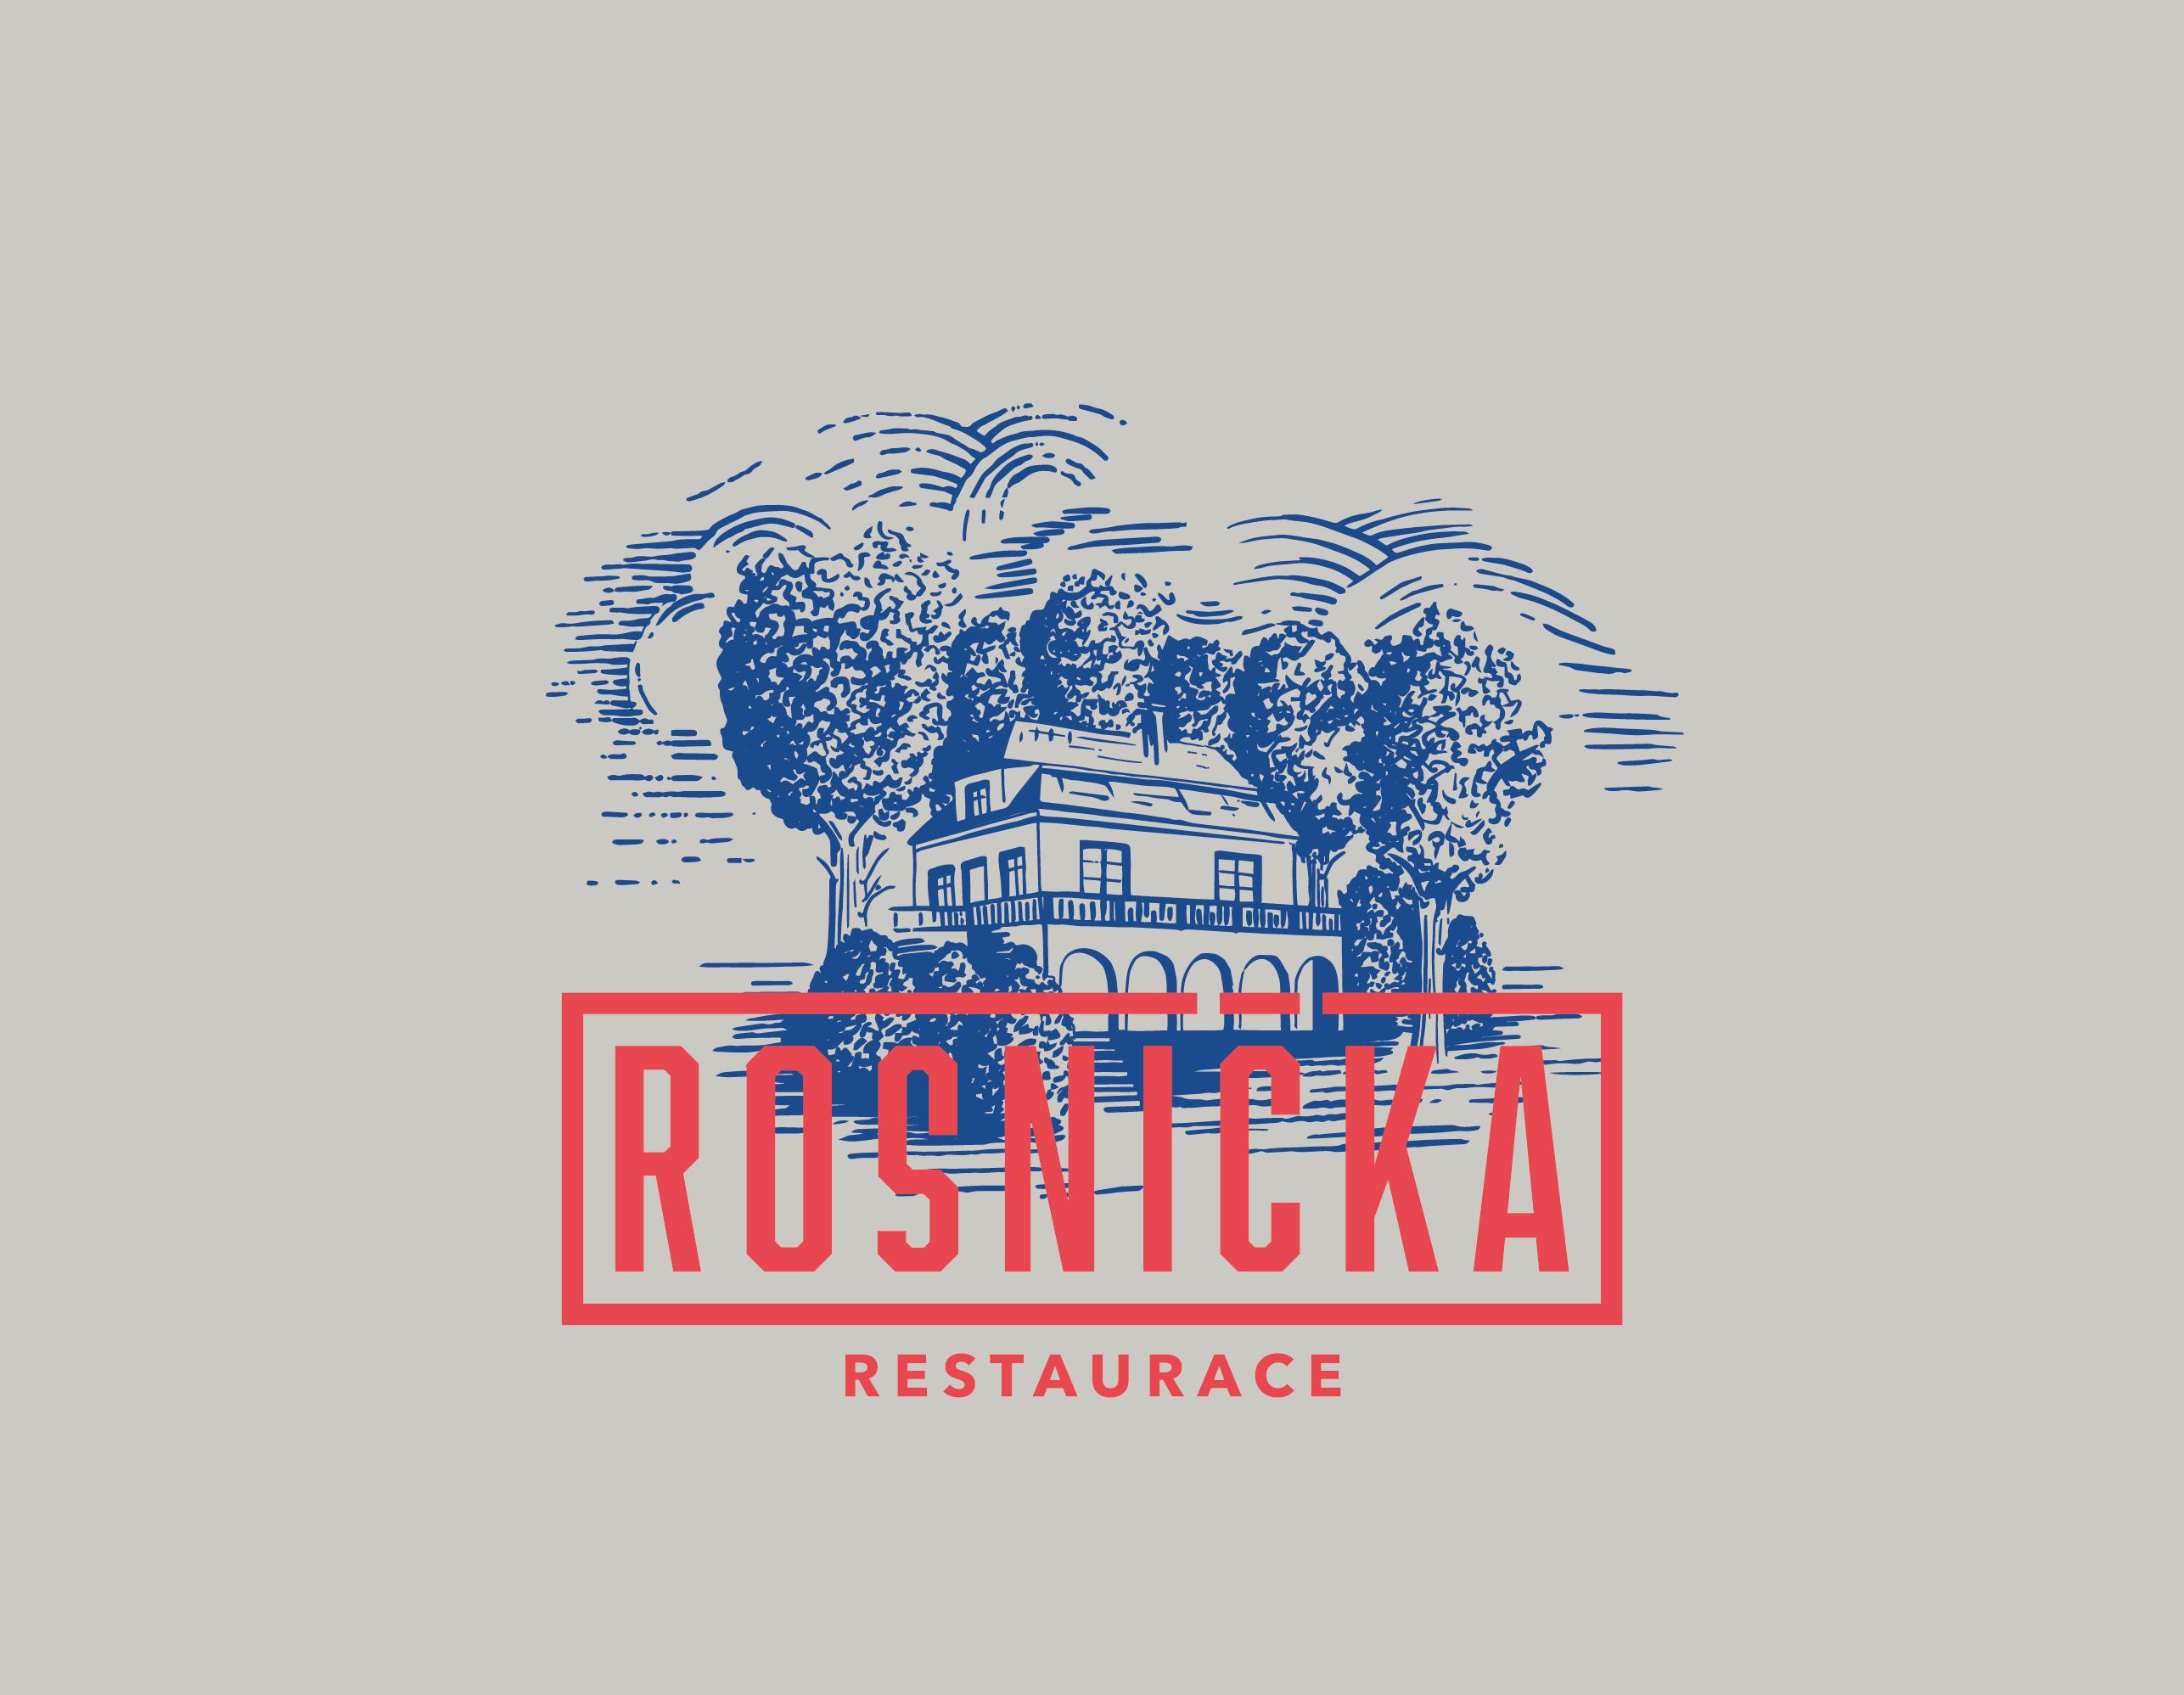 Rosnička Brno